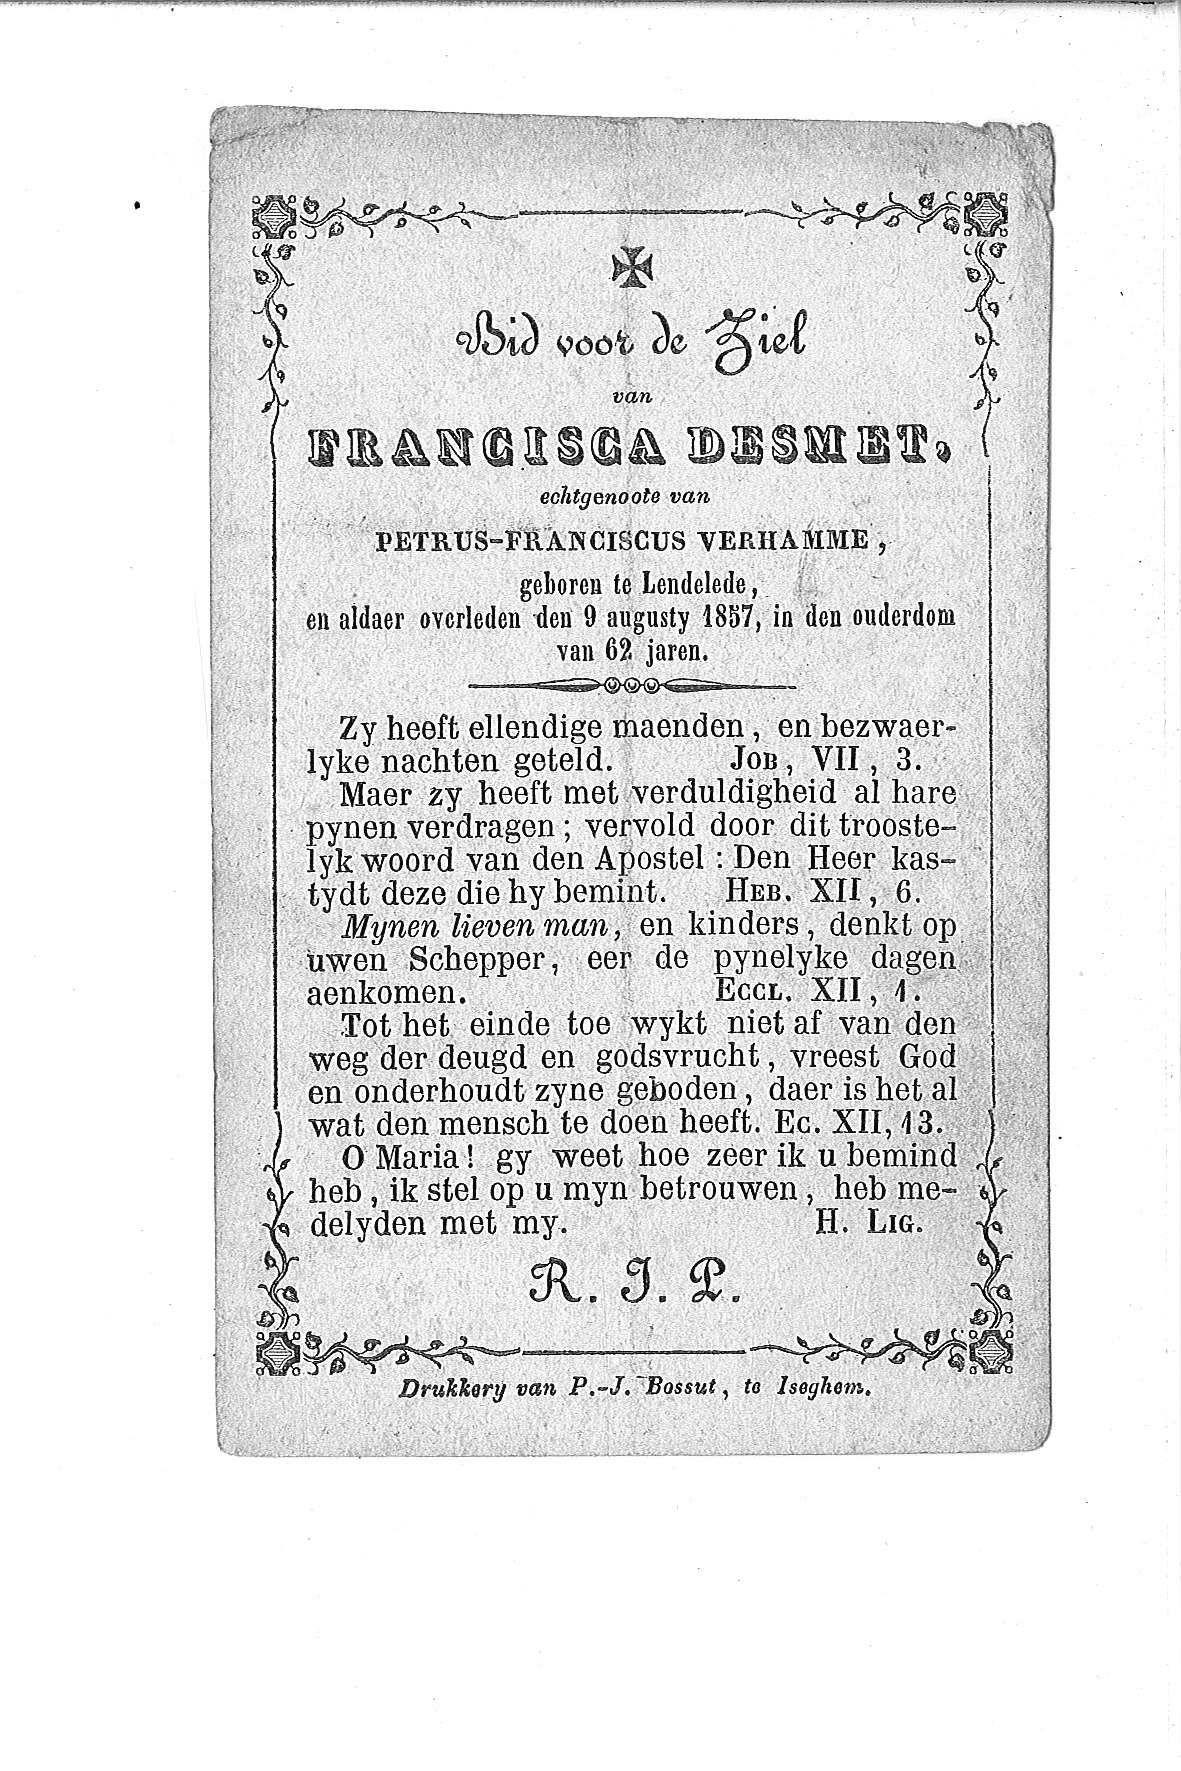 Francisca (1857) 20120502165716_00076.jpg